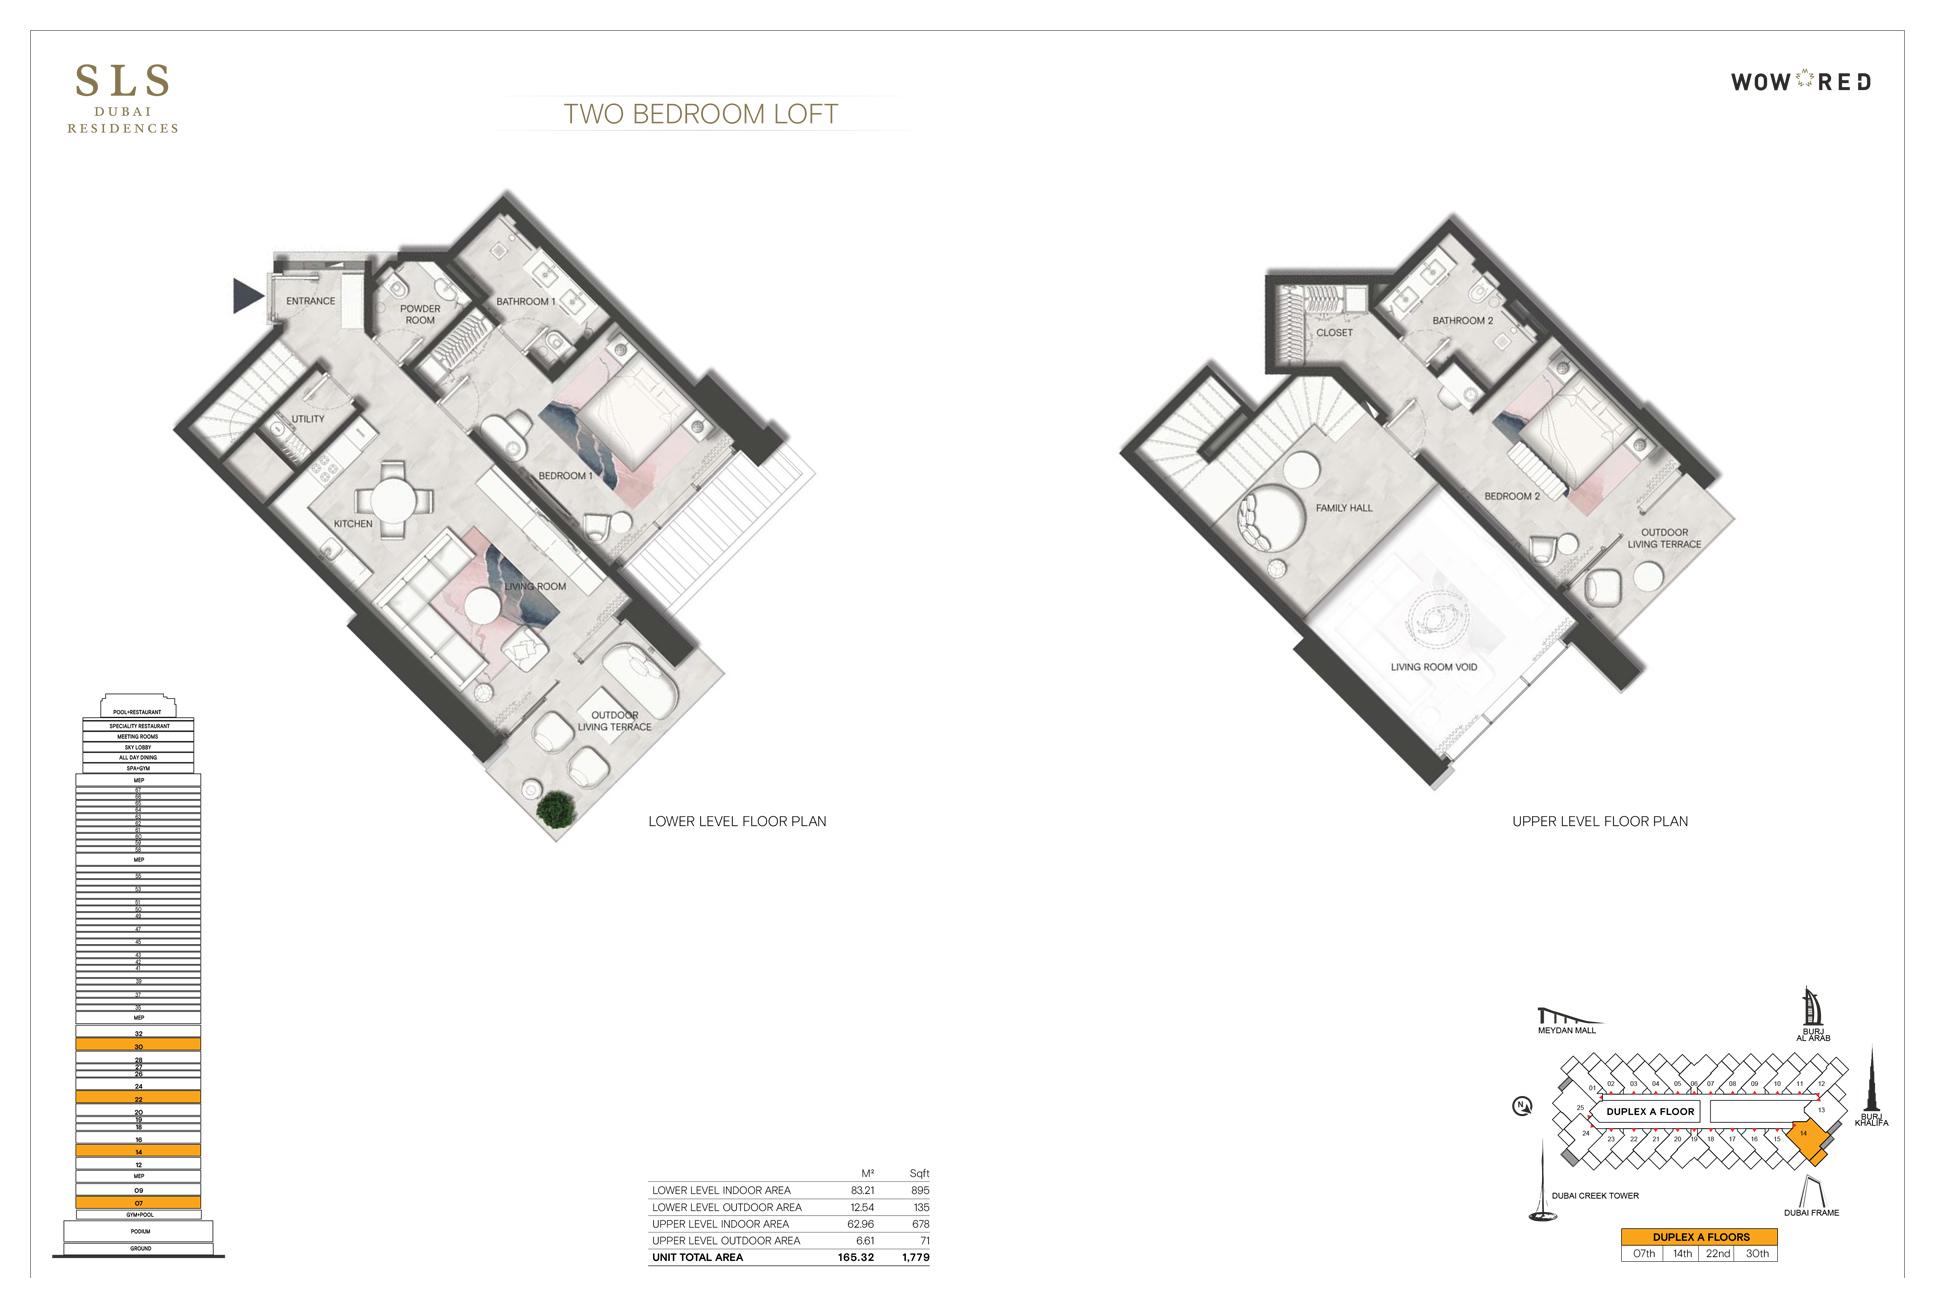 2 Bedroom Loft Size 1779 sq.ft